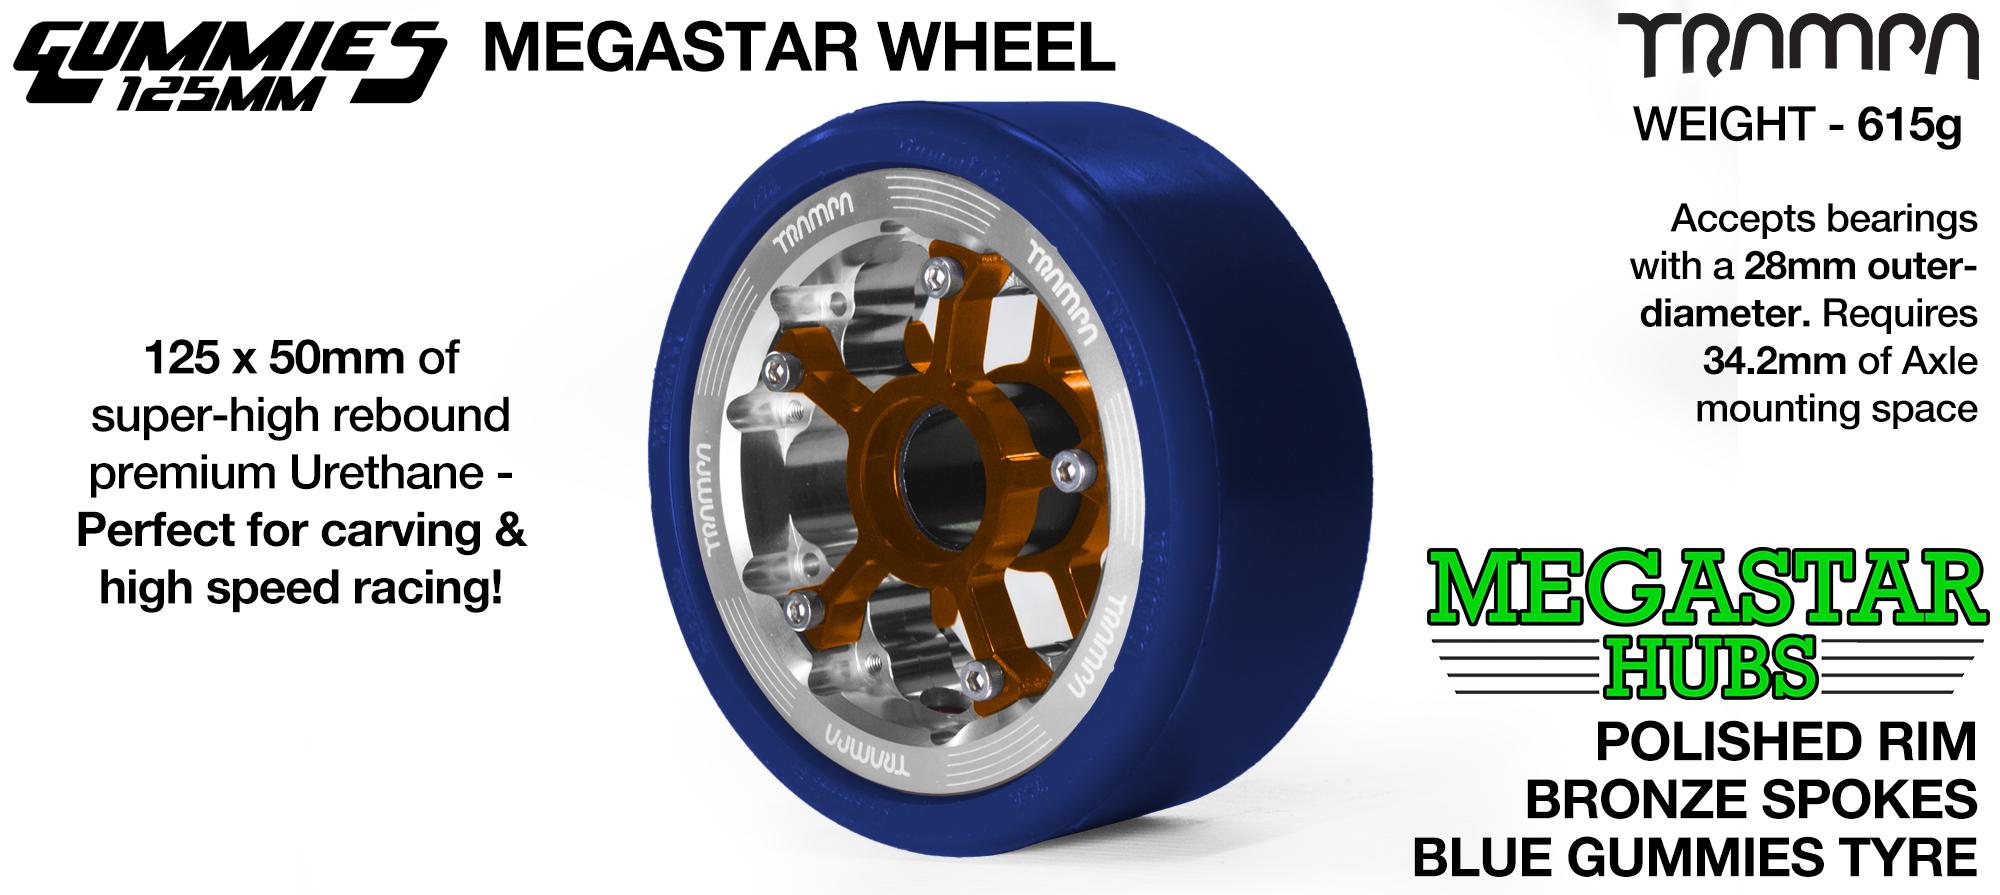 POLISHED MEGASTAR Rim with SILVER Spokes & BLACK Gummies - The Ulrimate Longboard Wheel